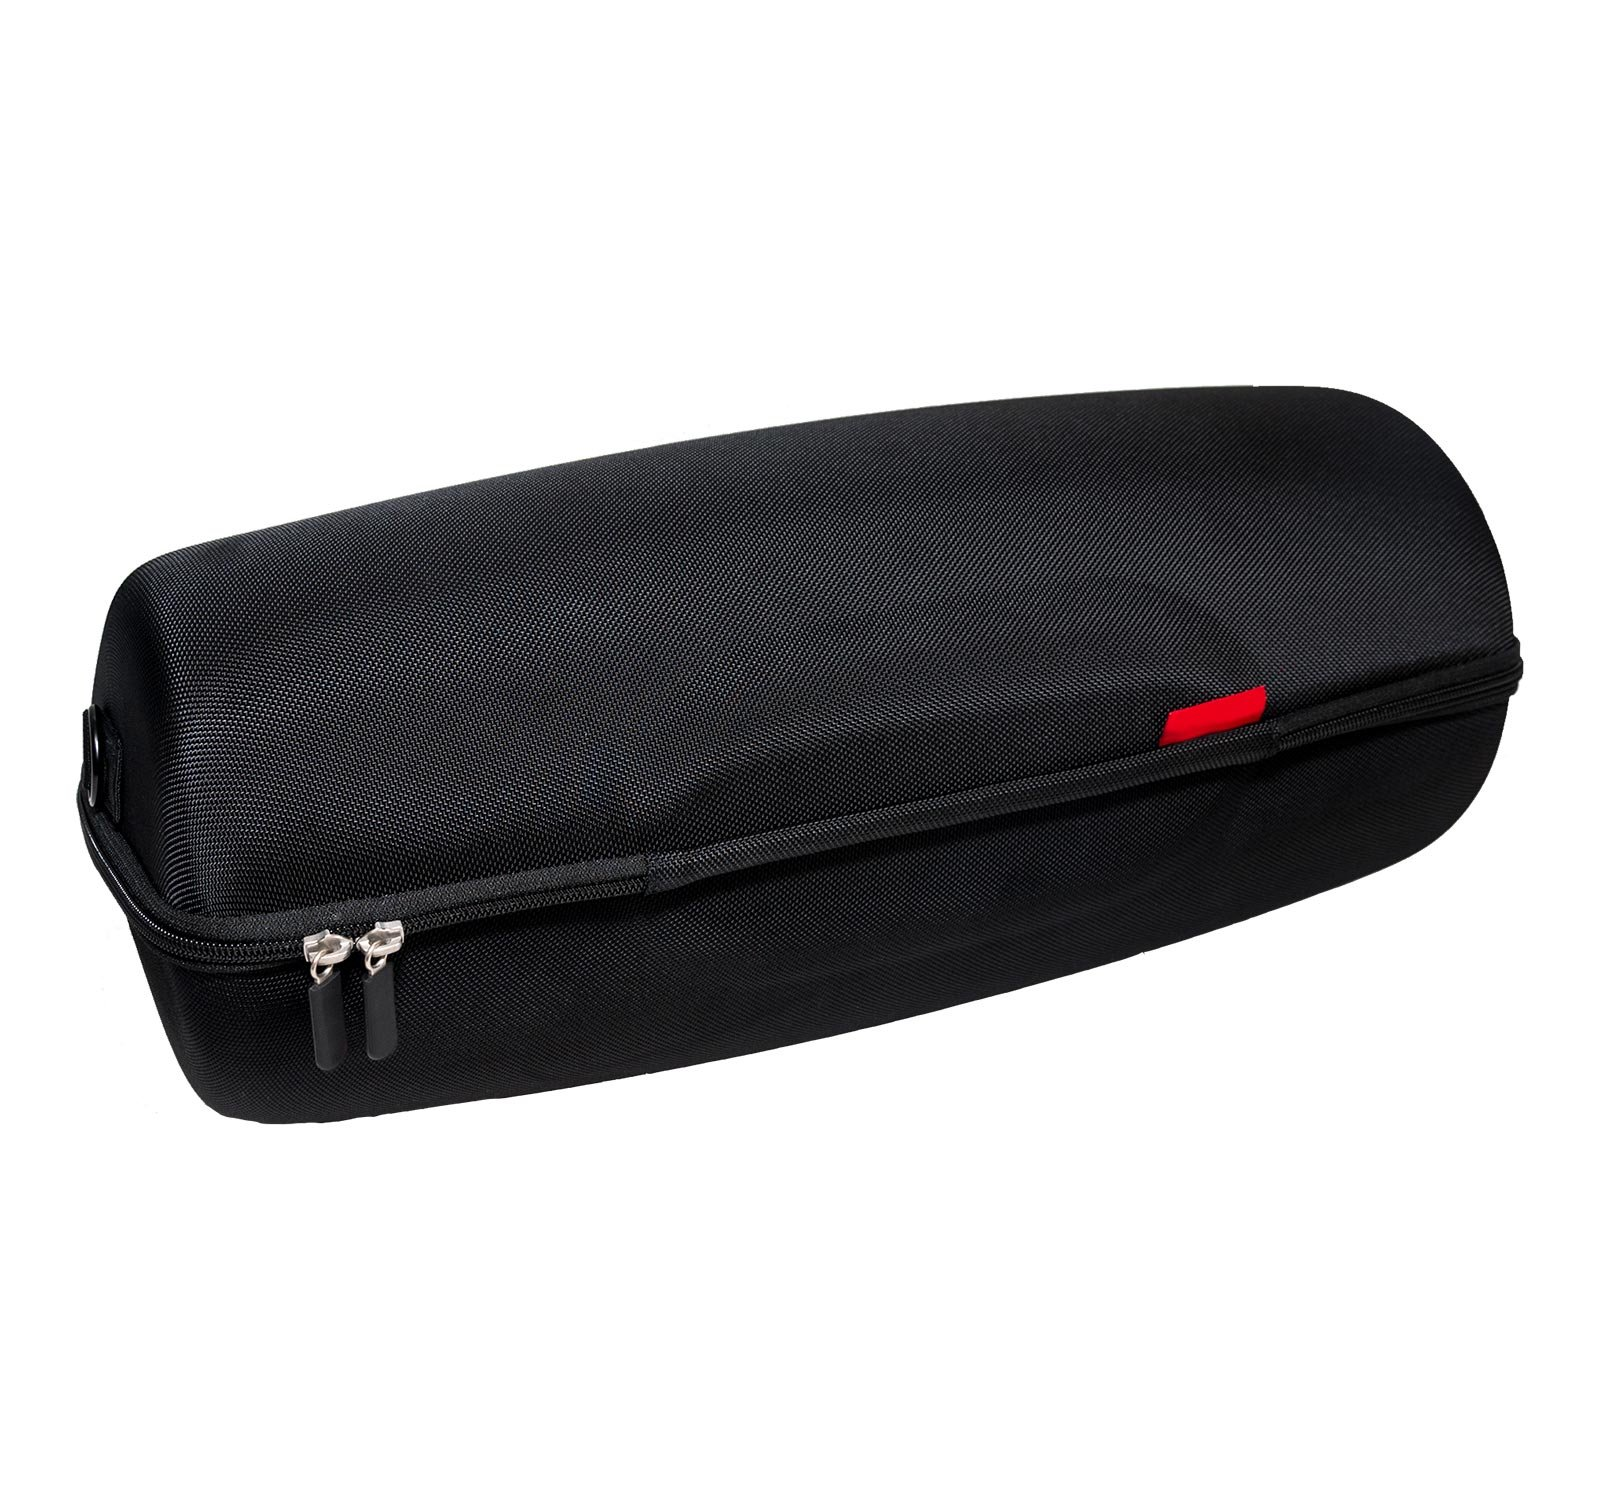 JBL Boombox Portable Bluetooth Waterproof Speaker Bundle with Hardshell Storage Case (Black) by JBL (Image #7)